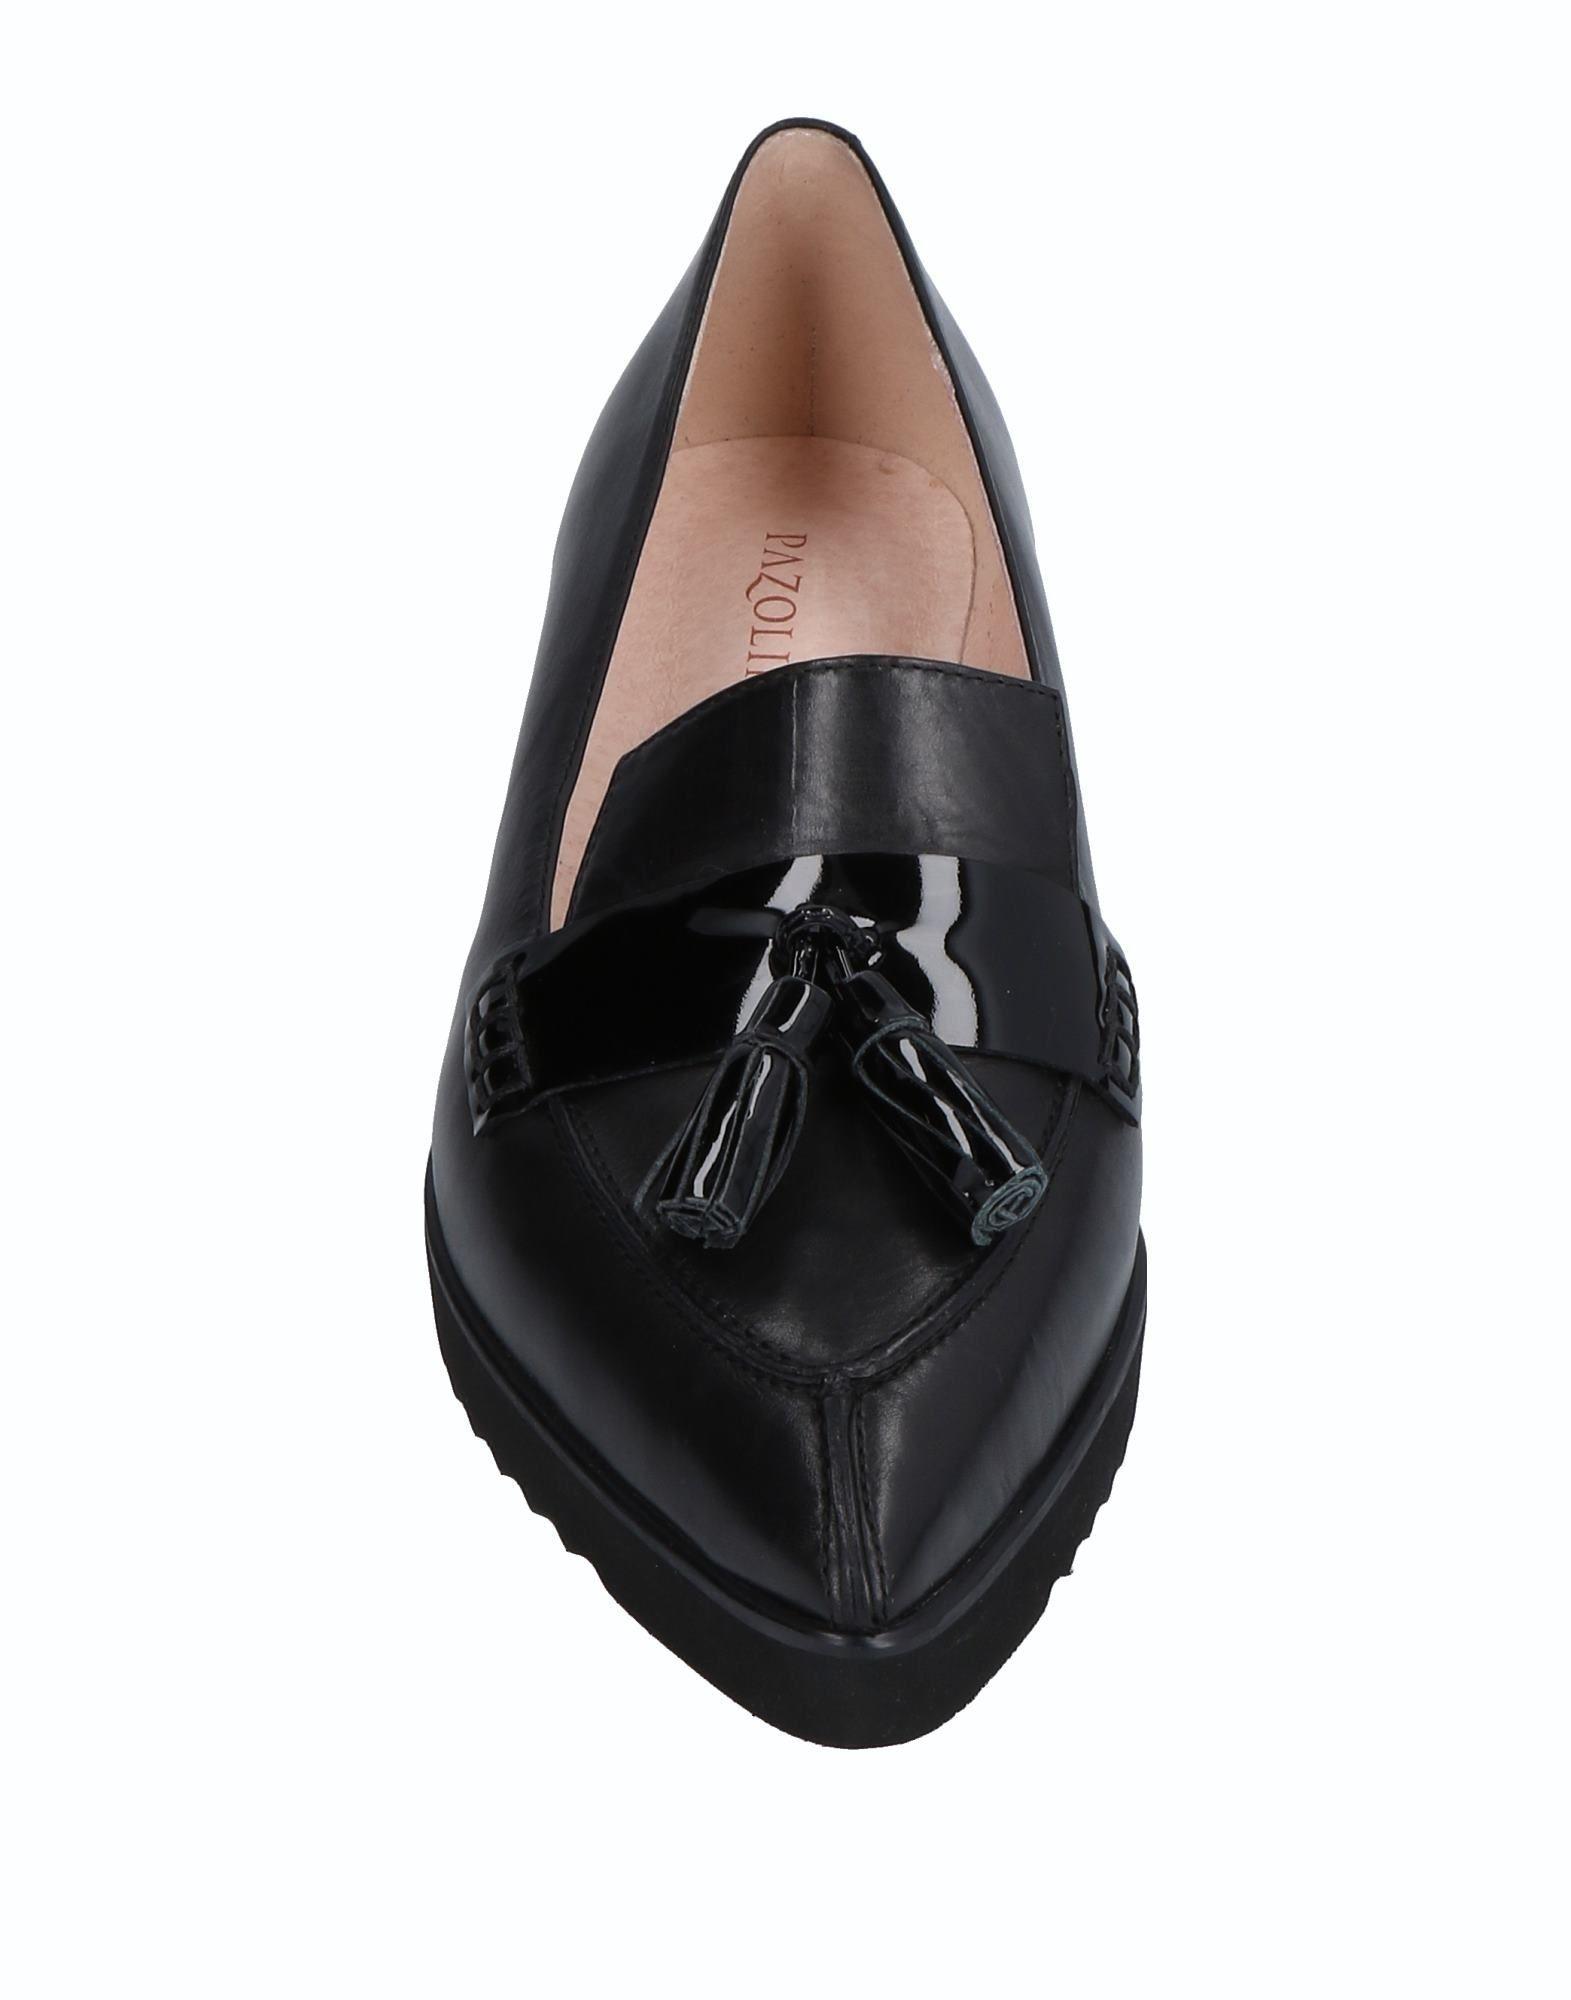 Carlo Pazolini Black Leather Loafers